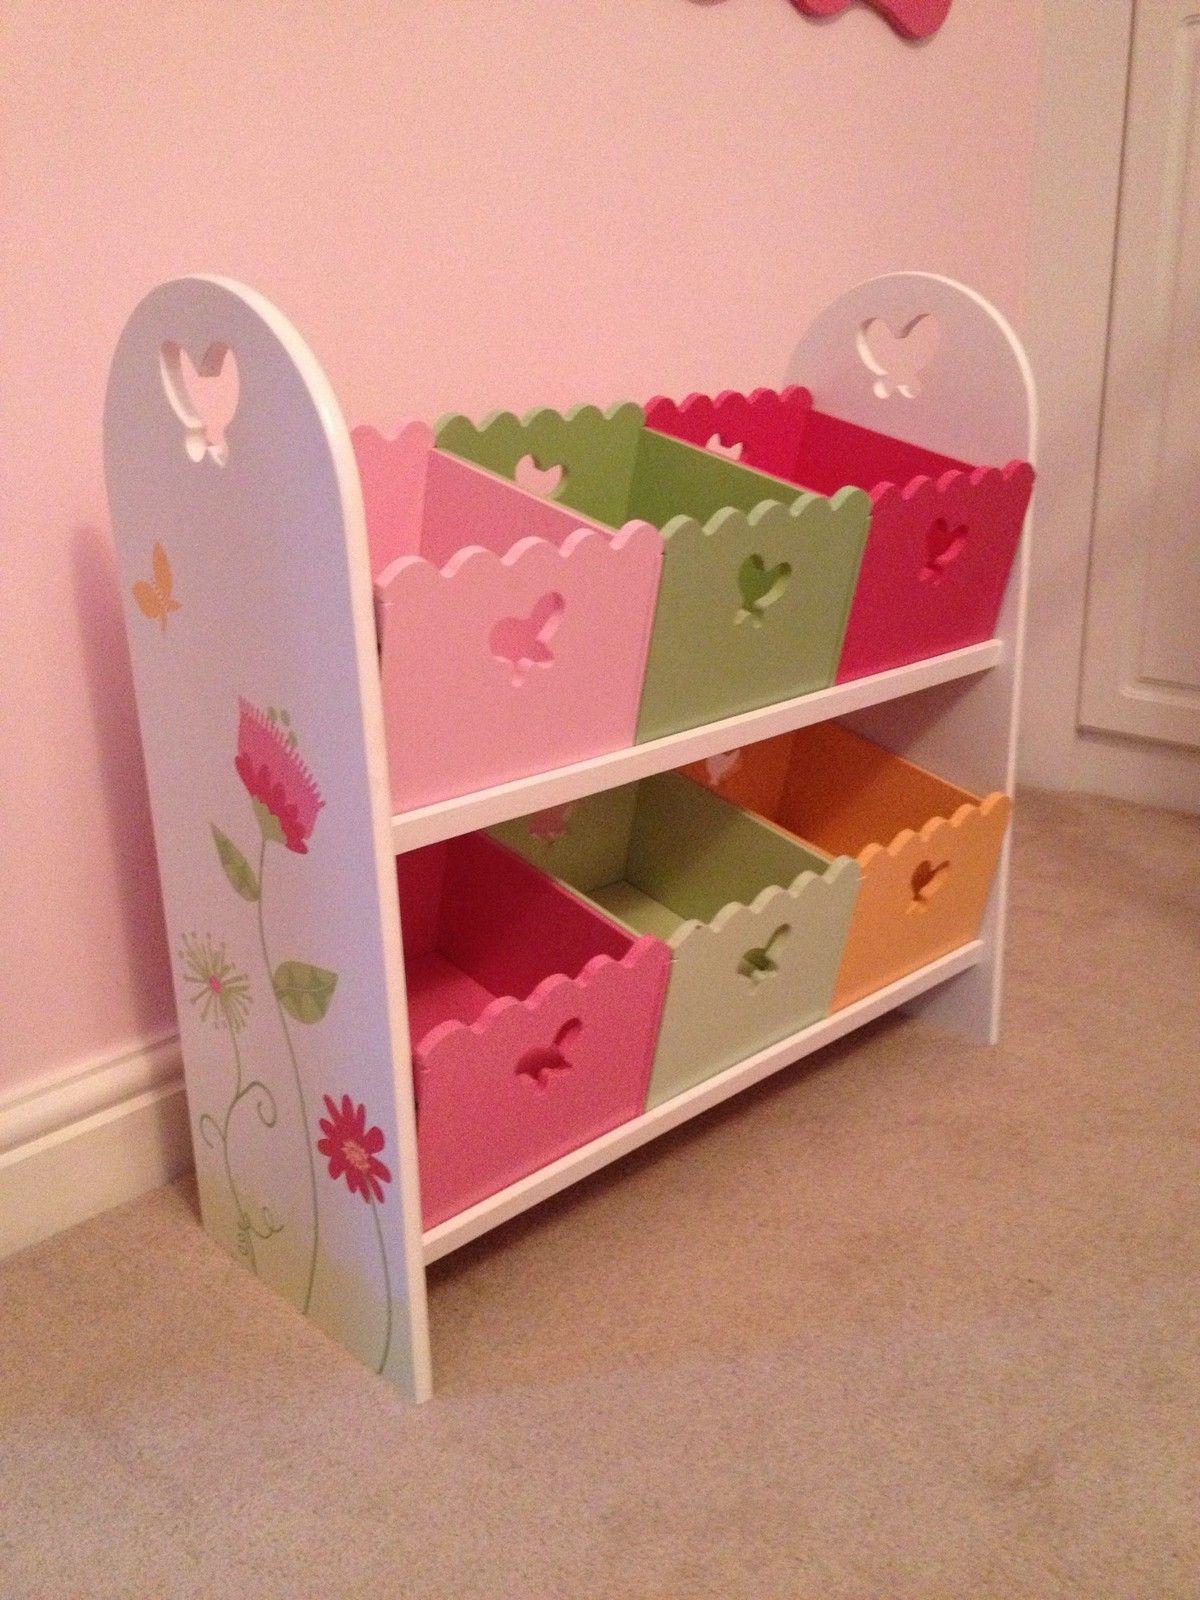 Kids Storage Cube Organizer Toy Box Kids Bedroom Furniture: ★VERTBAUDET★Wooden Storage Unit Toy Box Shelves★Girls Kids